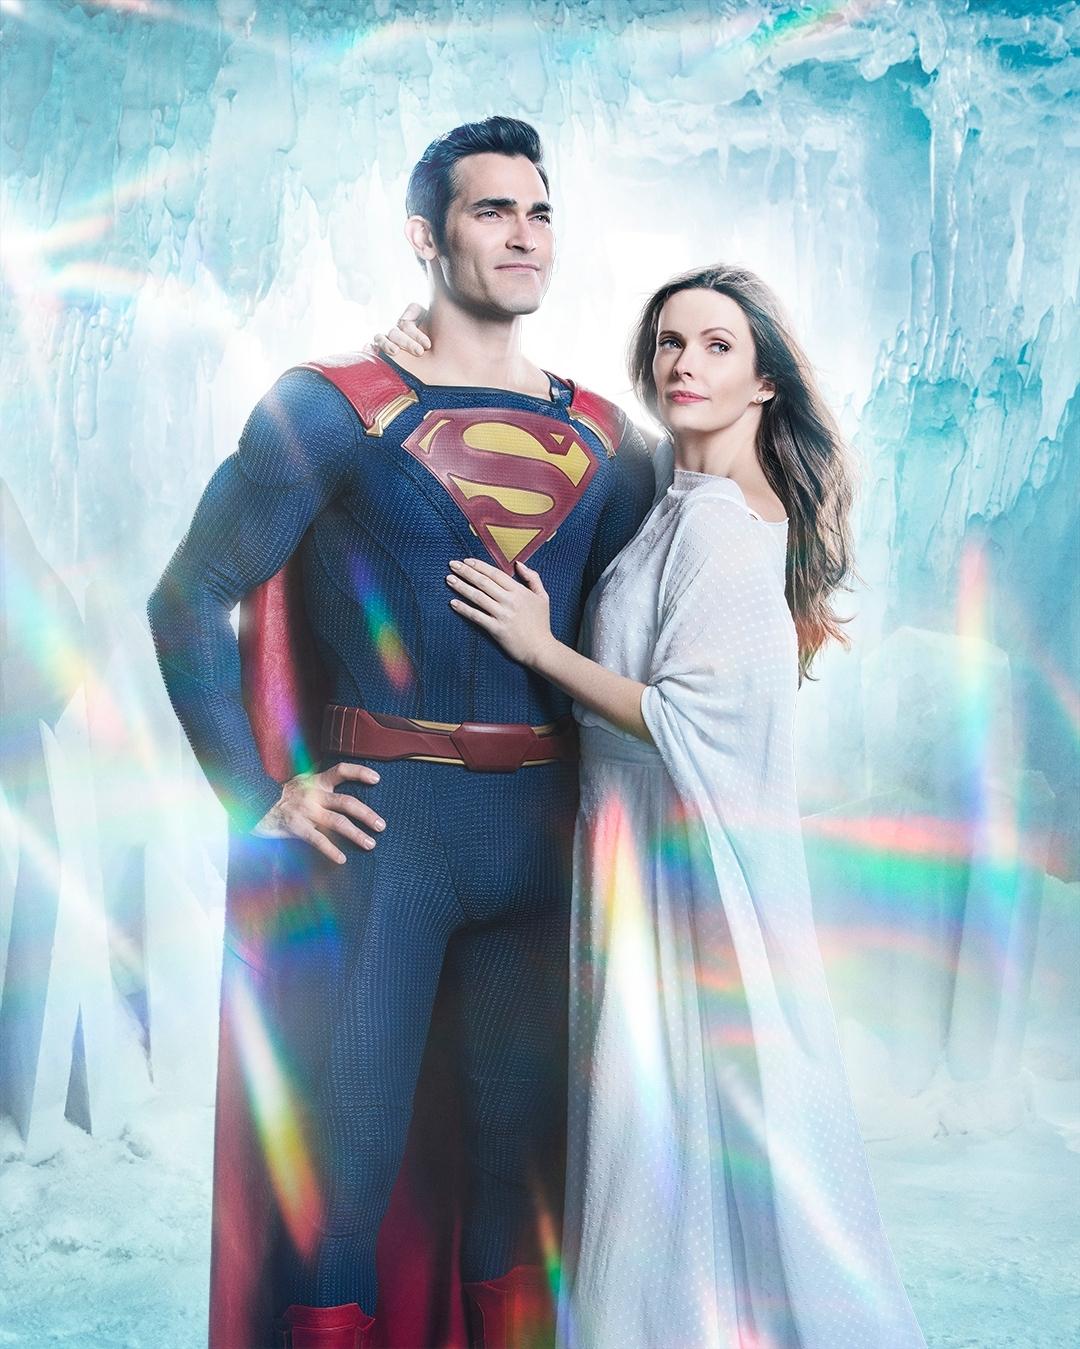 Supergirl Lex Luthor Superman Lois Lane